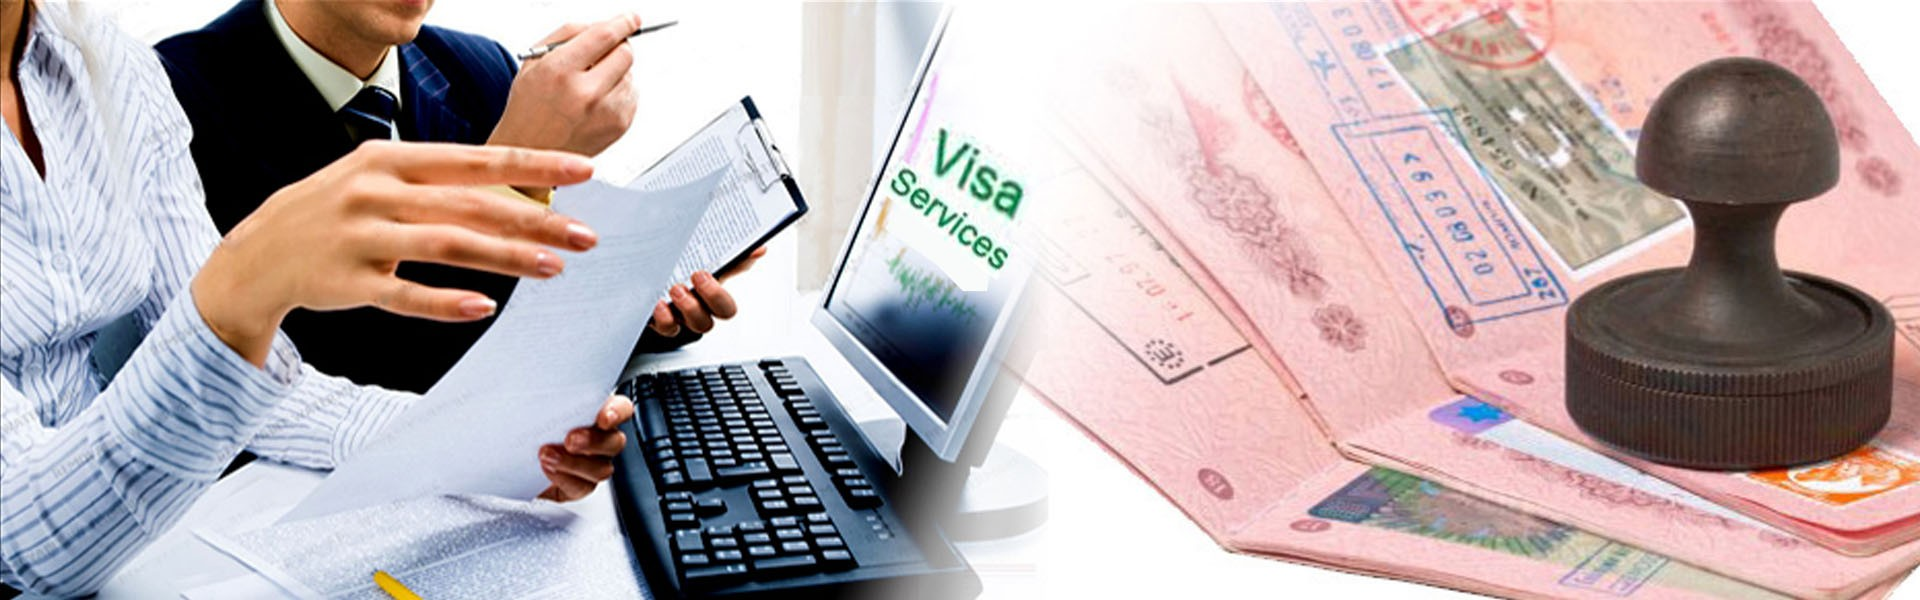 Hyderabad Global Visas Consultant